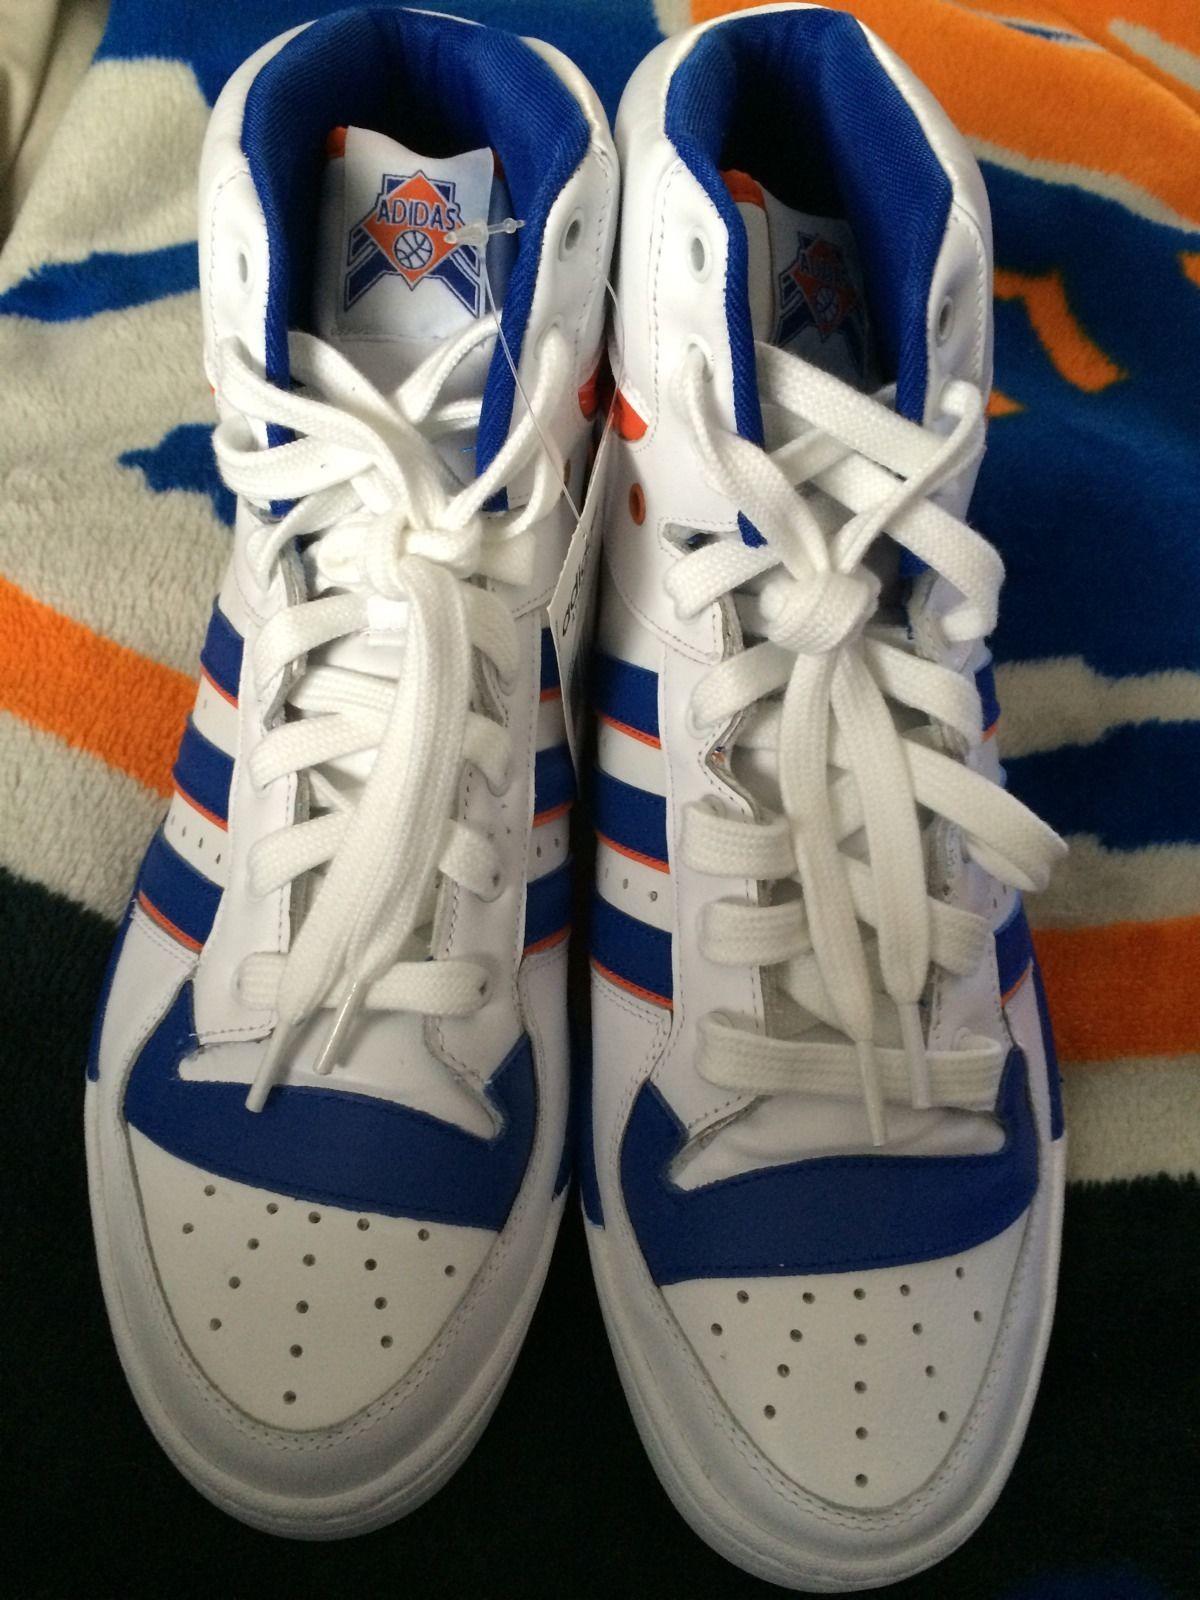 Adidas Attitude Hi New York Knicks Patrick Ewing Basektaball Shoe